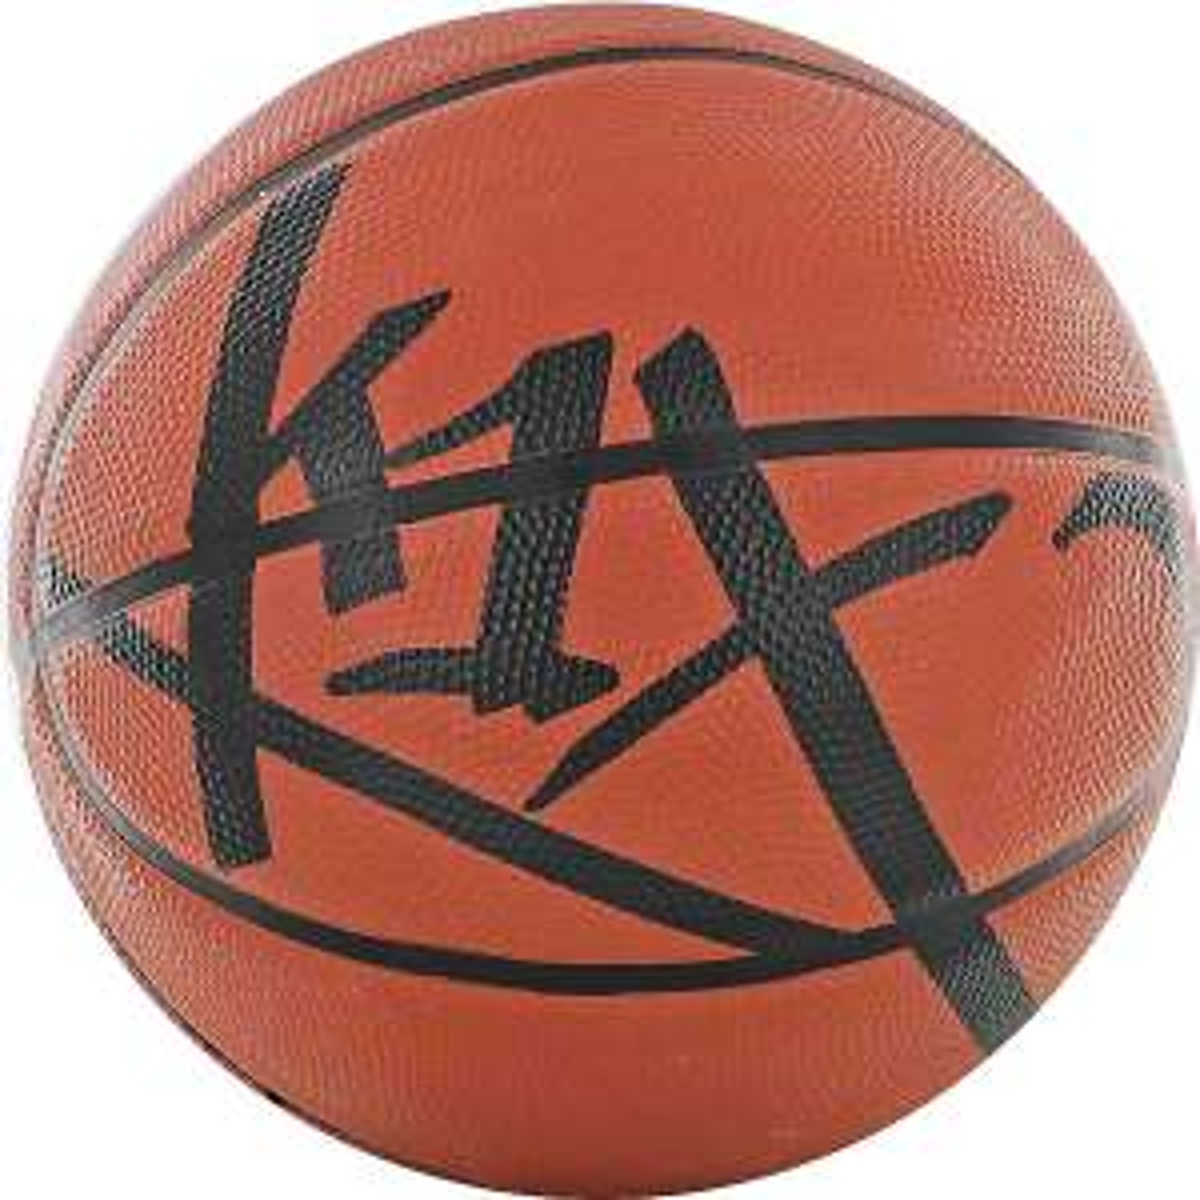 K1X MILLION BUCKS BASKETBALL